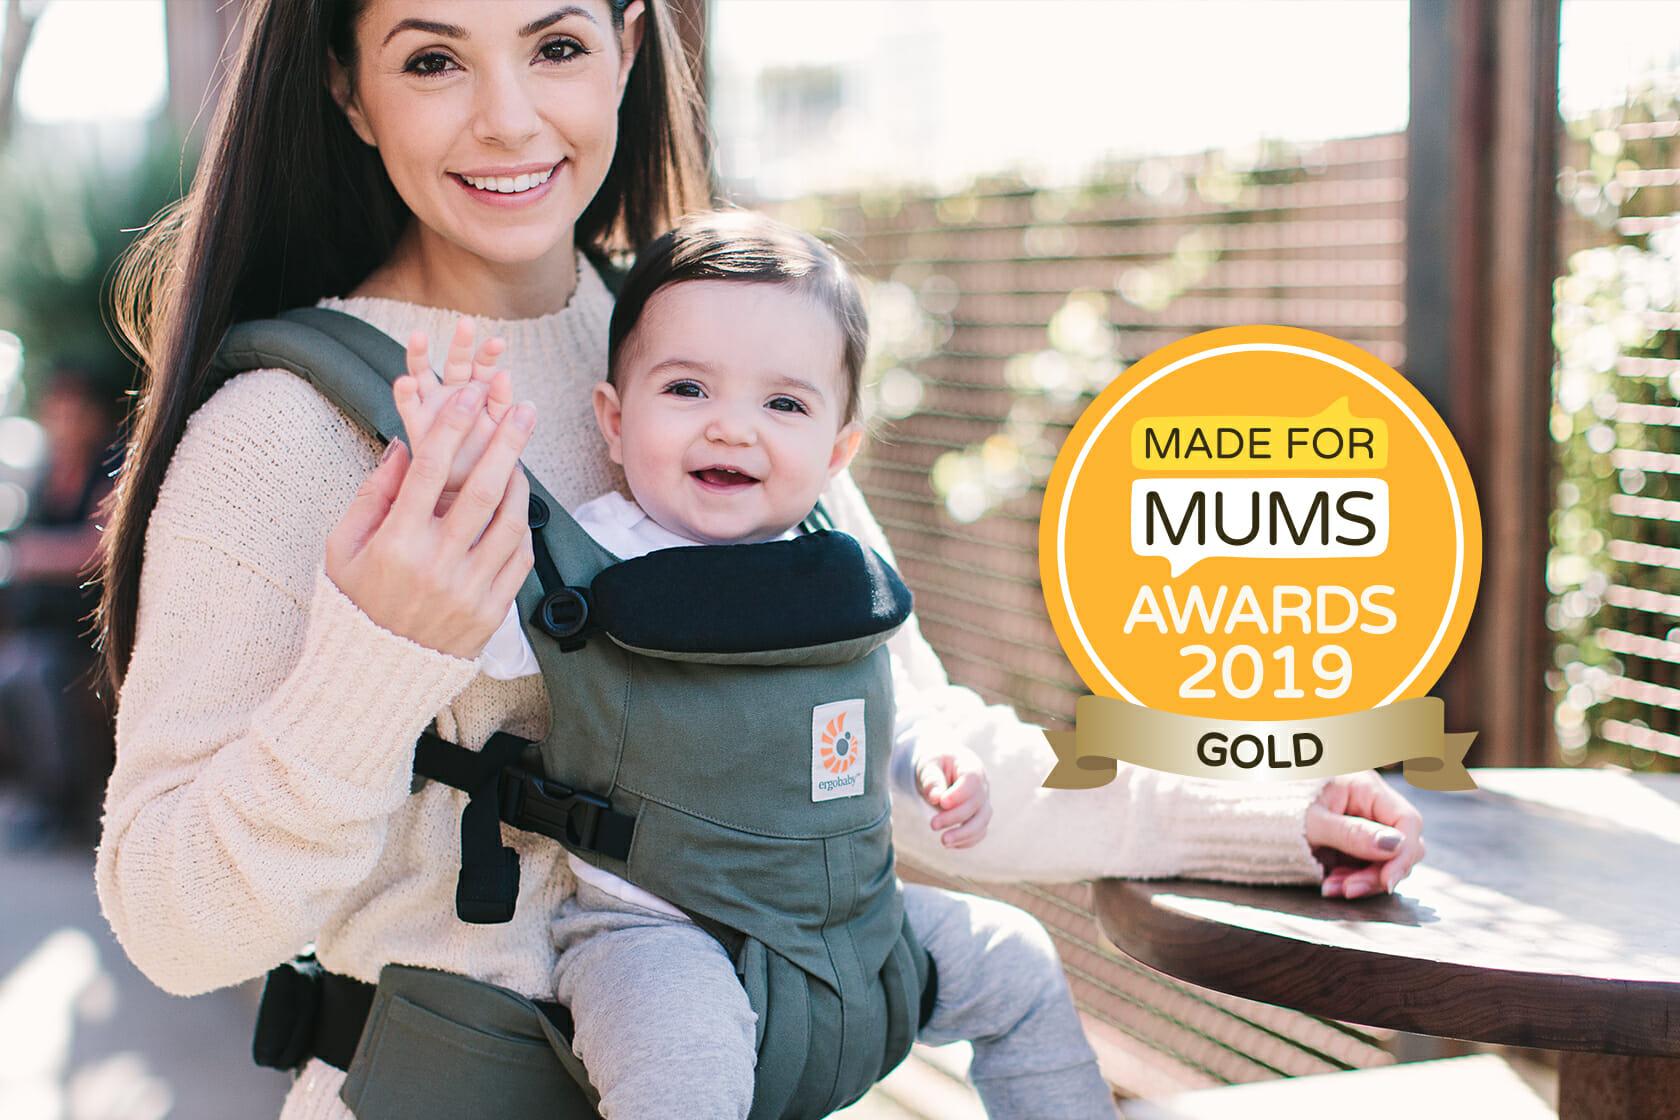 Ergobaby UK | Made for Mum Awards 2019 | Ergobaby Omni 360 Baby Carrier